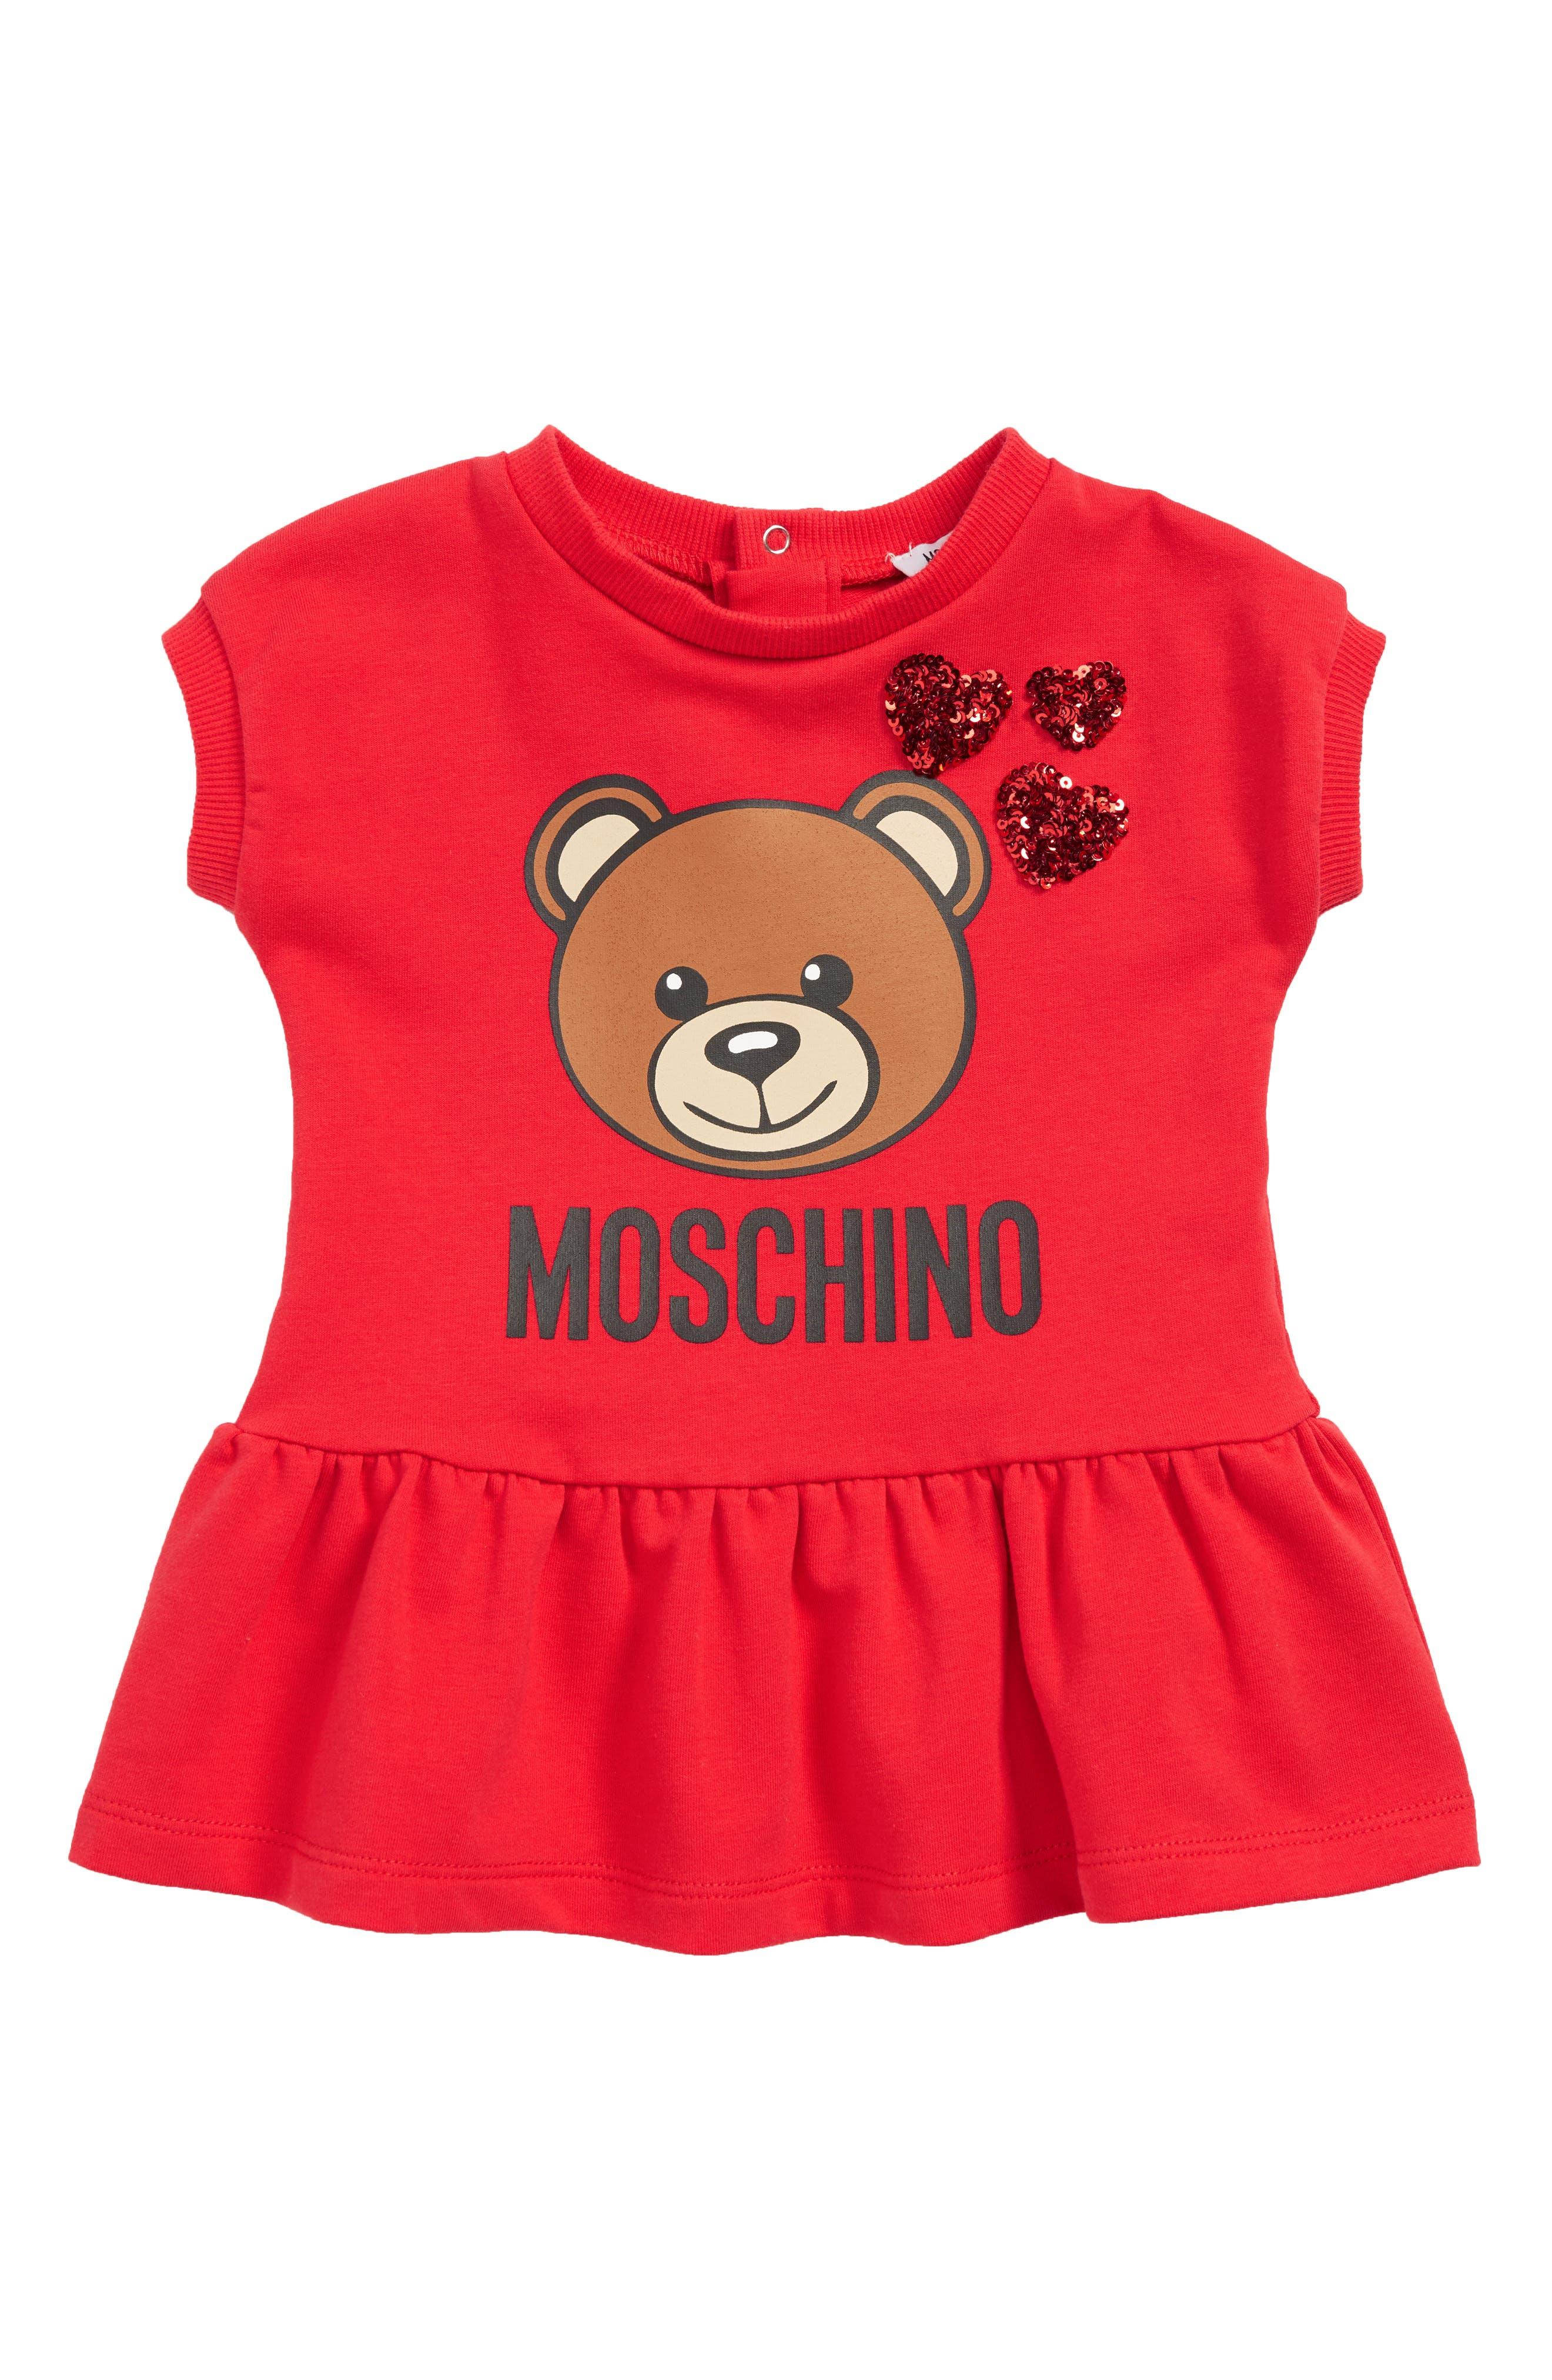 MOSCHINO, Toy Bear & Sequin Heart Dress, Main thumbnail 1, color, 600